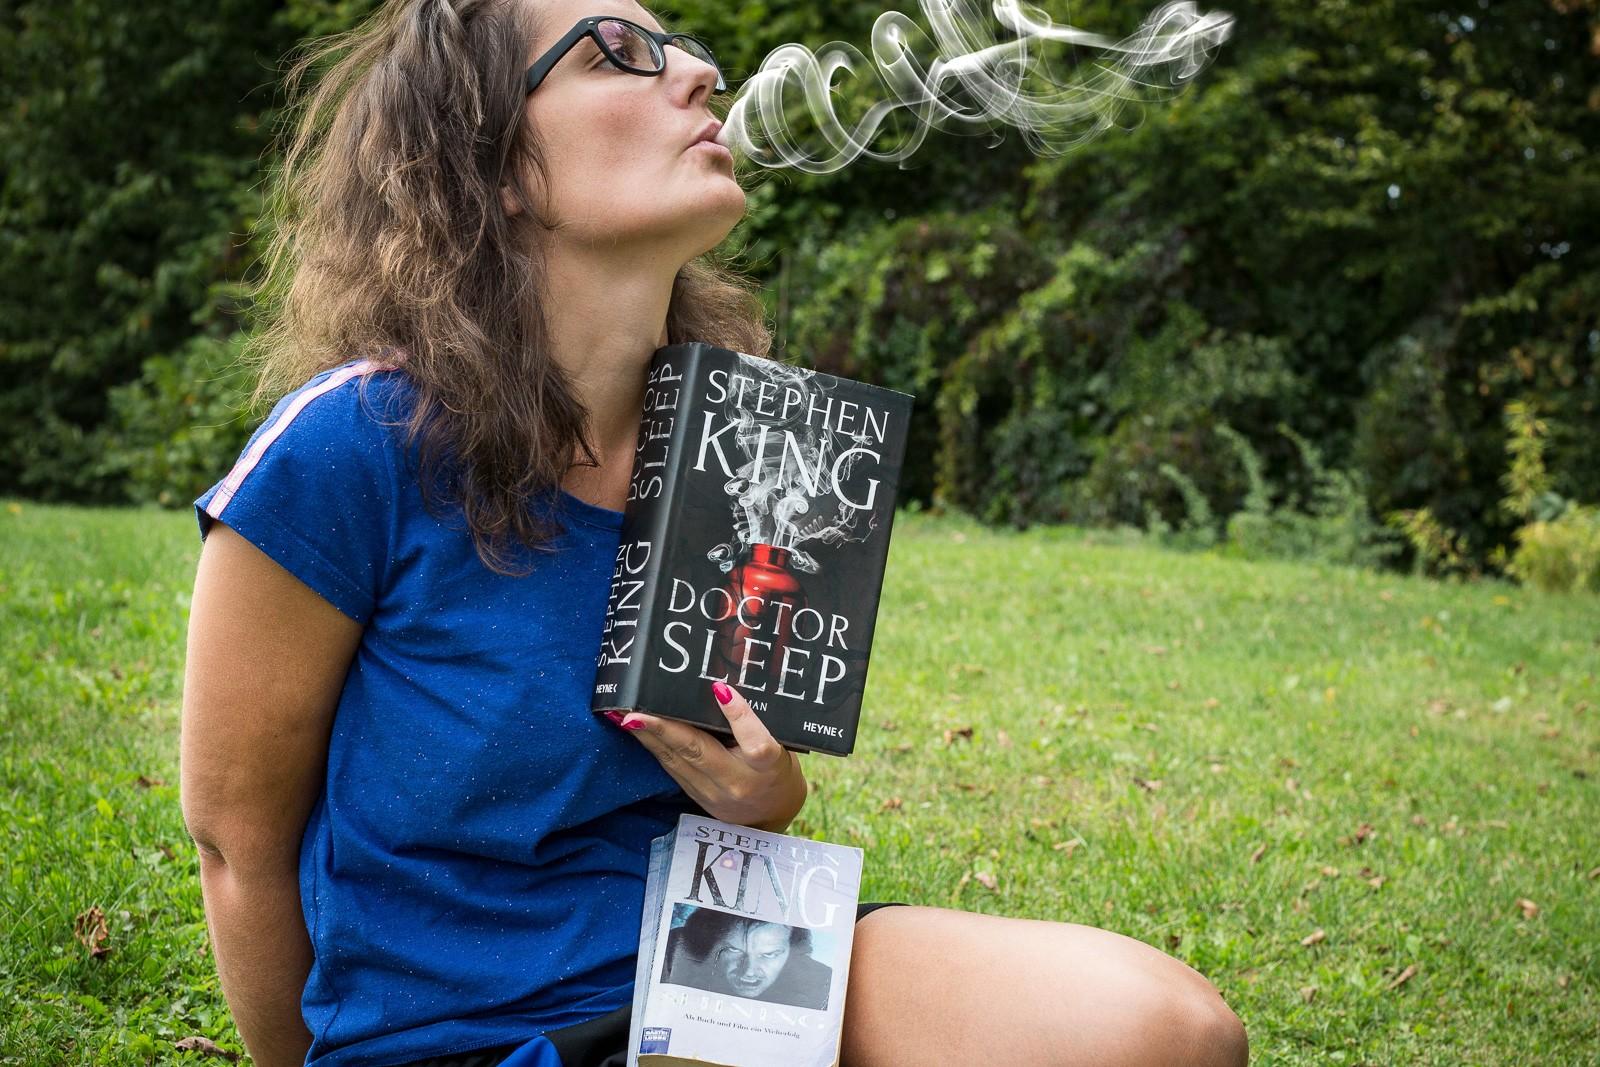 Doctor Sleep - Stephen King - Steam